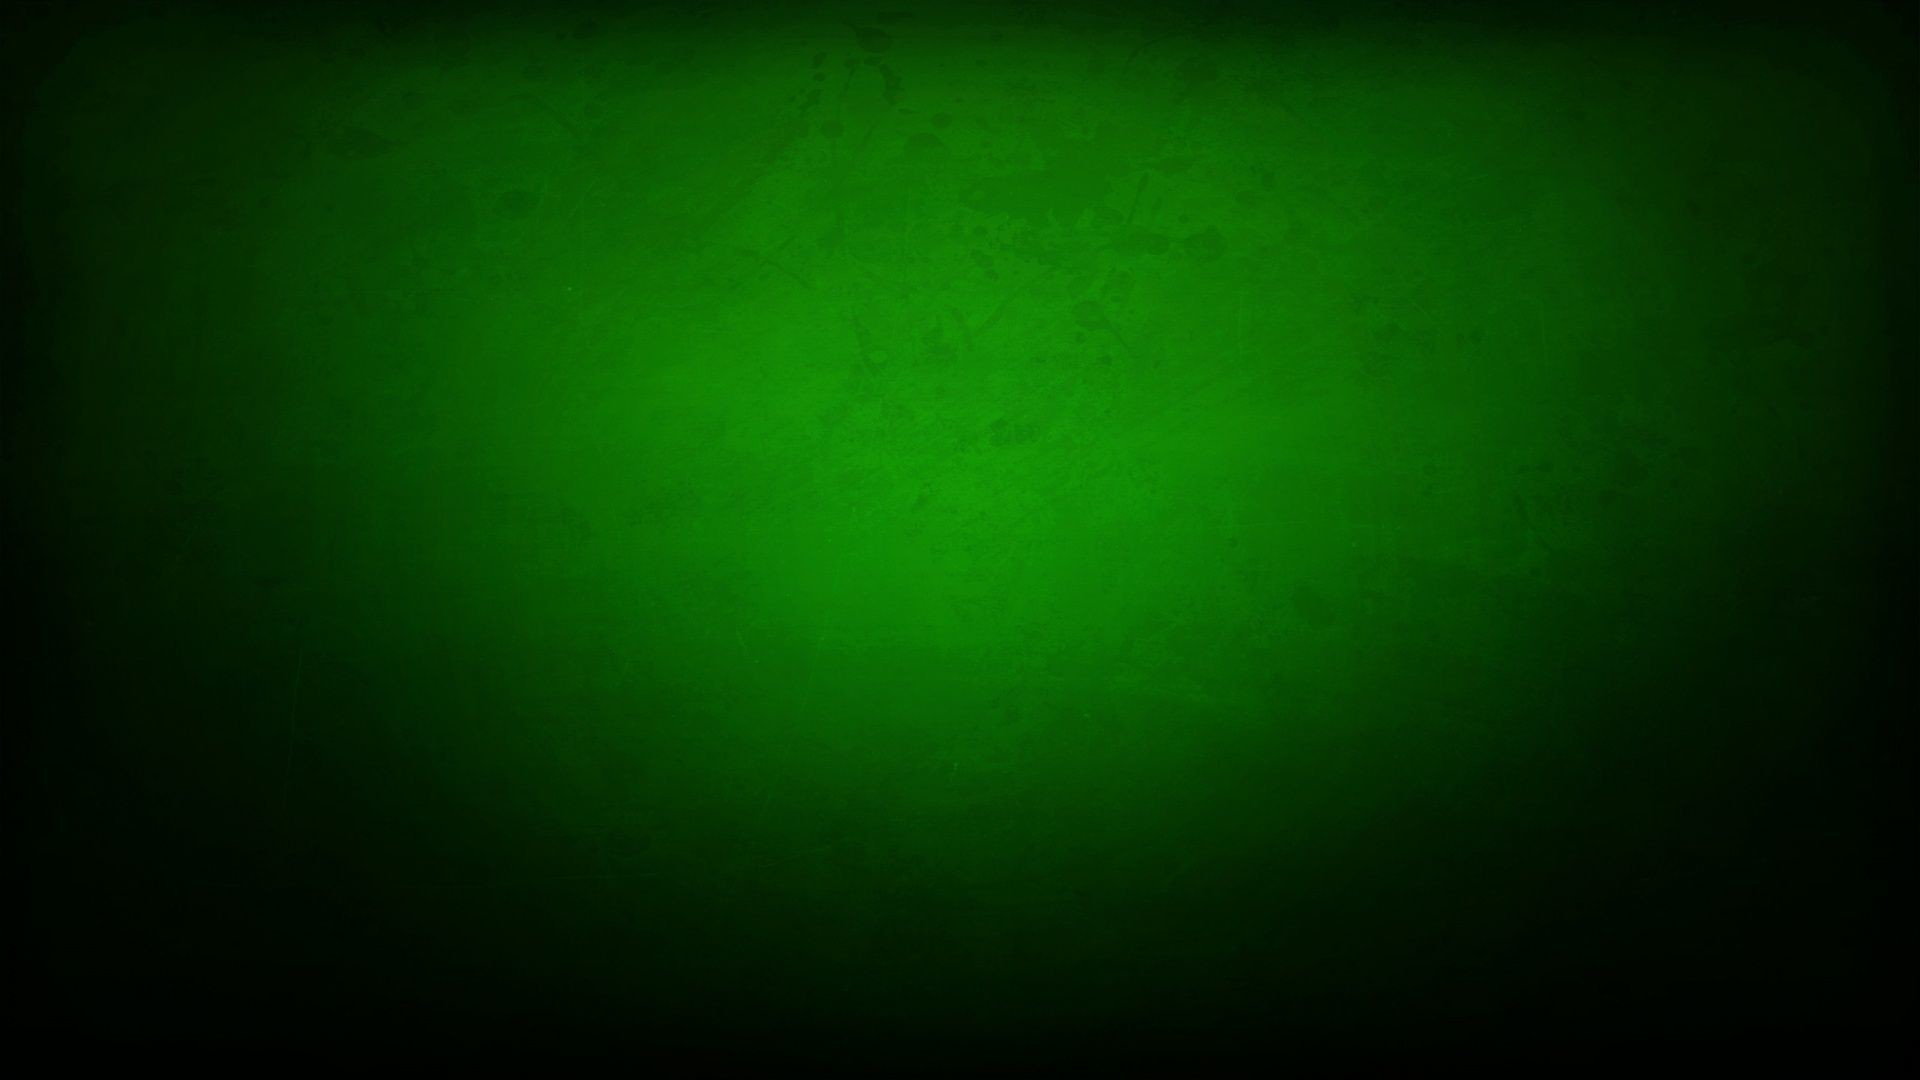 Green Backgrounds Image Wallpaper 1920×1080 Green Backgrounds (36 Wallpapers)    Adorable Wallpapers